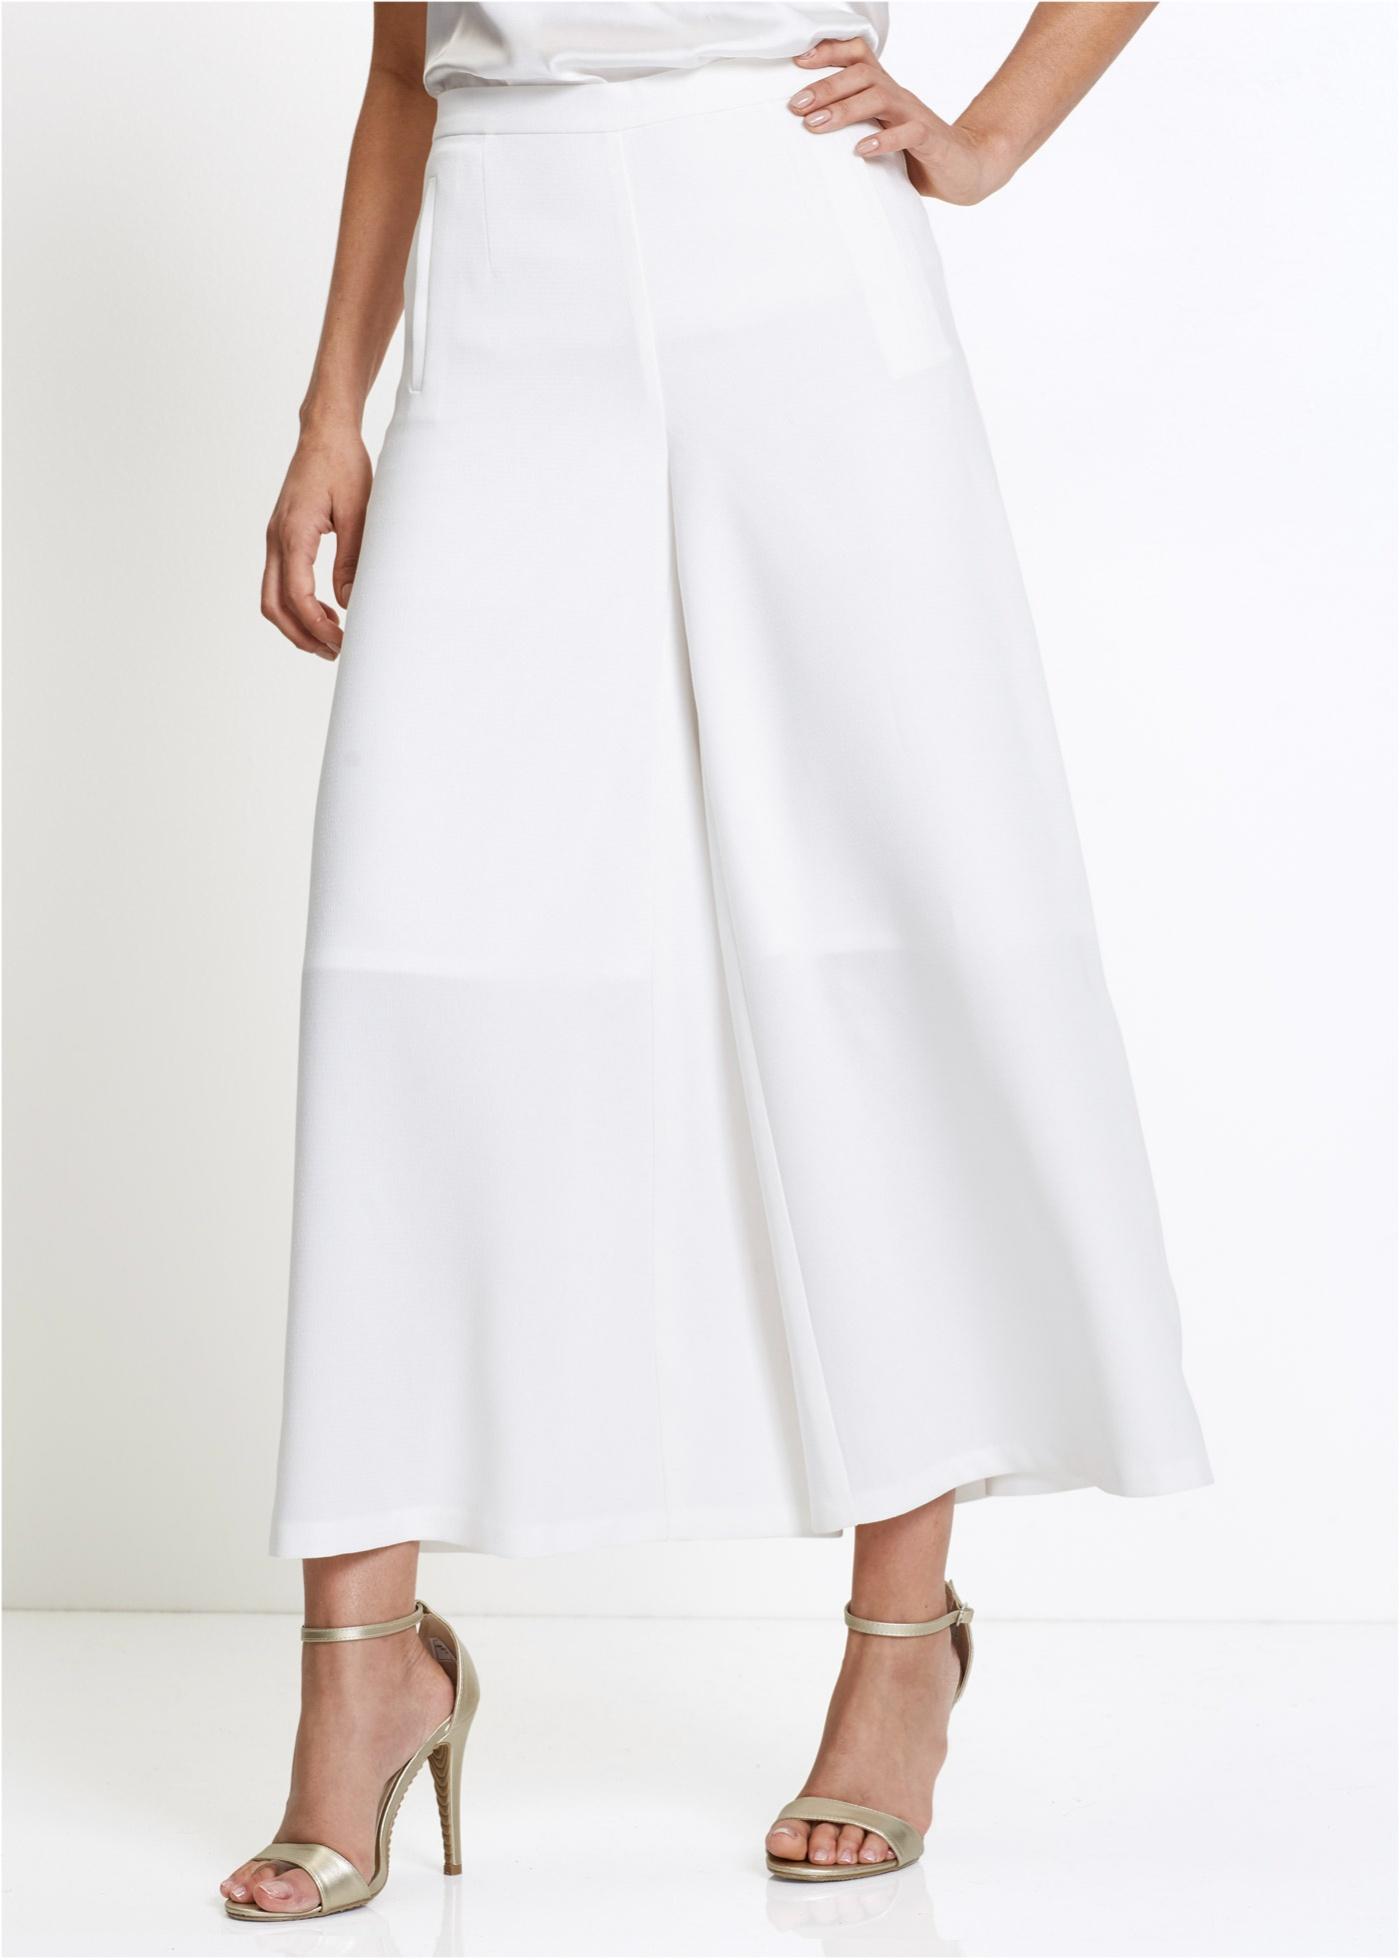 Bonprix Premium 7/8 culotte